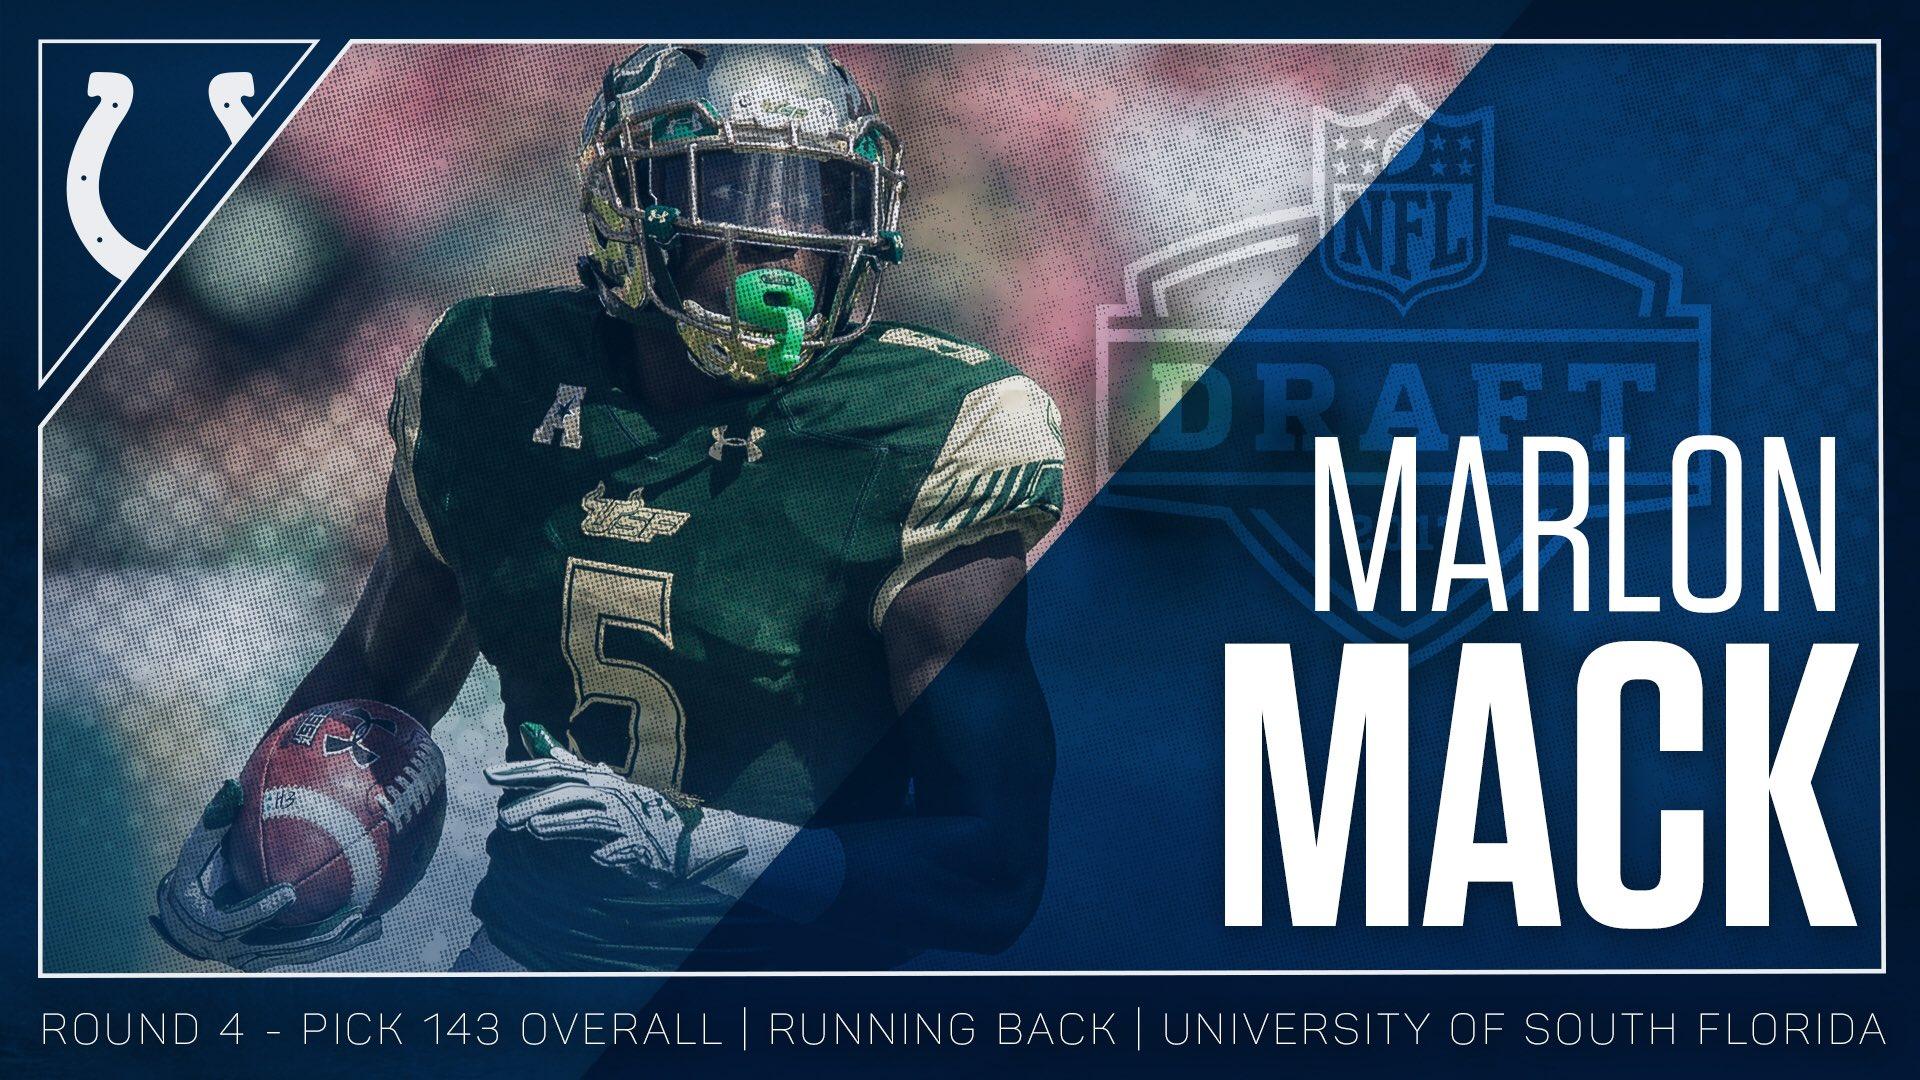 We got a running back. #ColtsDraft   Welcome to the horseshoe, @Marlon_Mack2! https://t.co/iY0avZqbi1